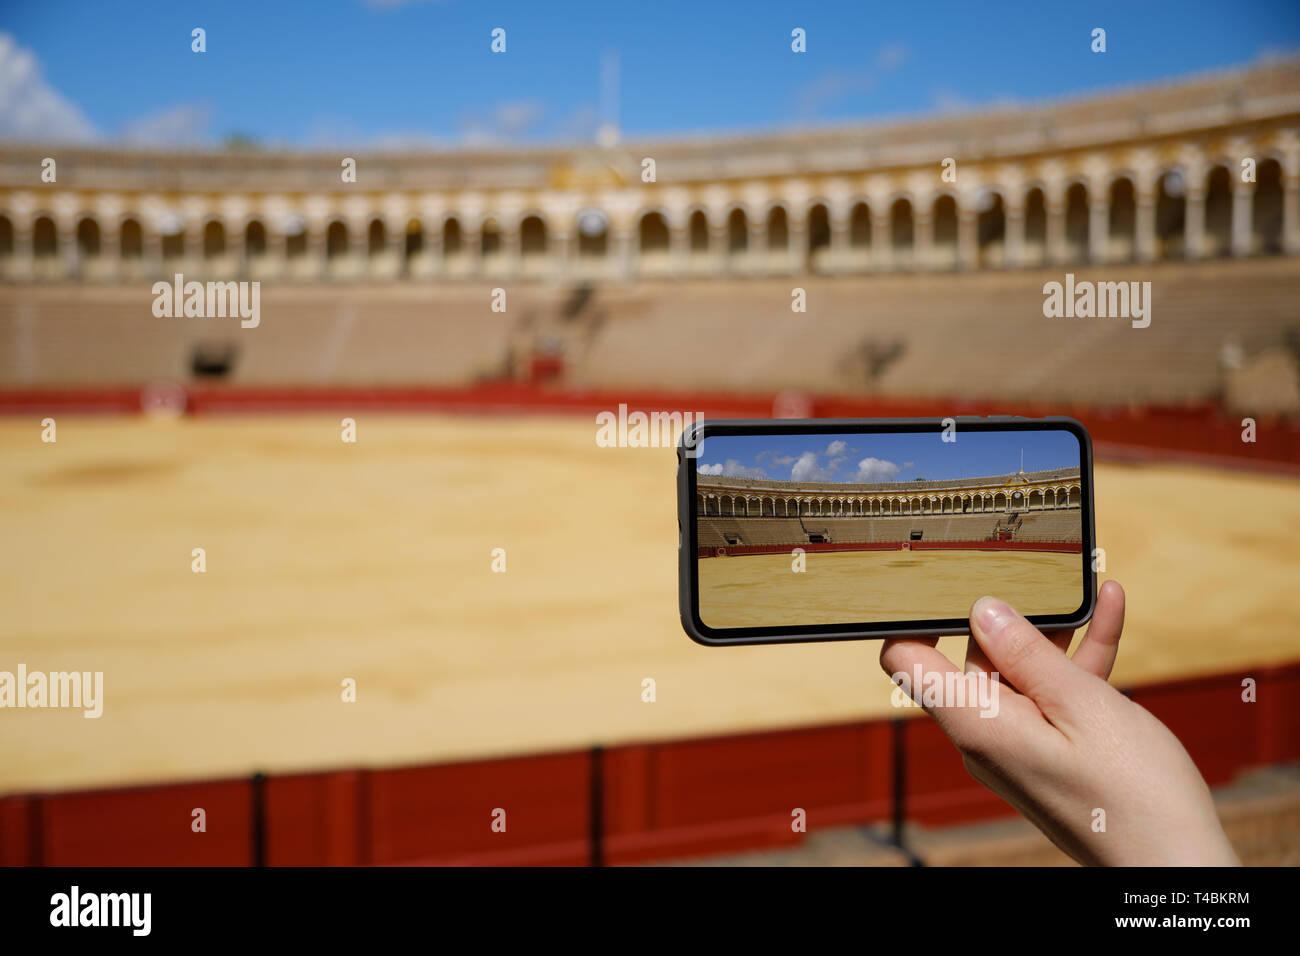 woman hand take a photo with smart phone to Bullfighting arena (plaza de toros) in Seville, Real Maestranza de Caballeria de Sevilla, Spain - April 20 - Stock Image